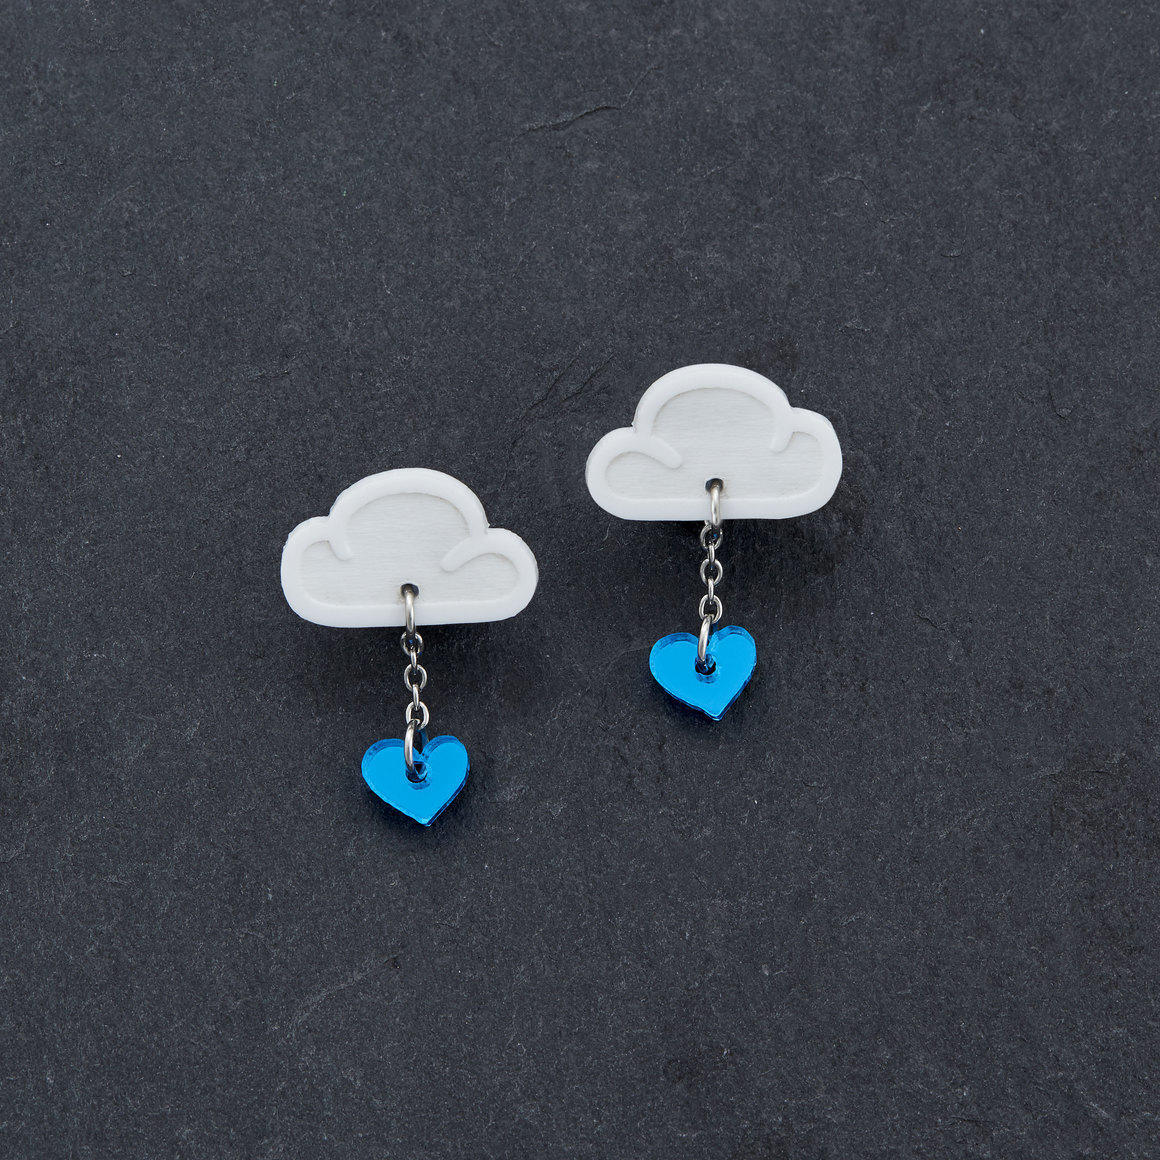 Stud Earrings -  LOVE RAINDROPS - White | Trada Marketplace